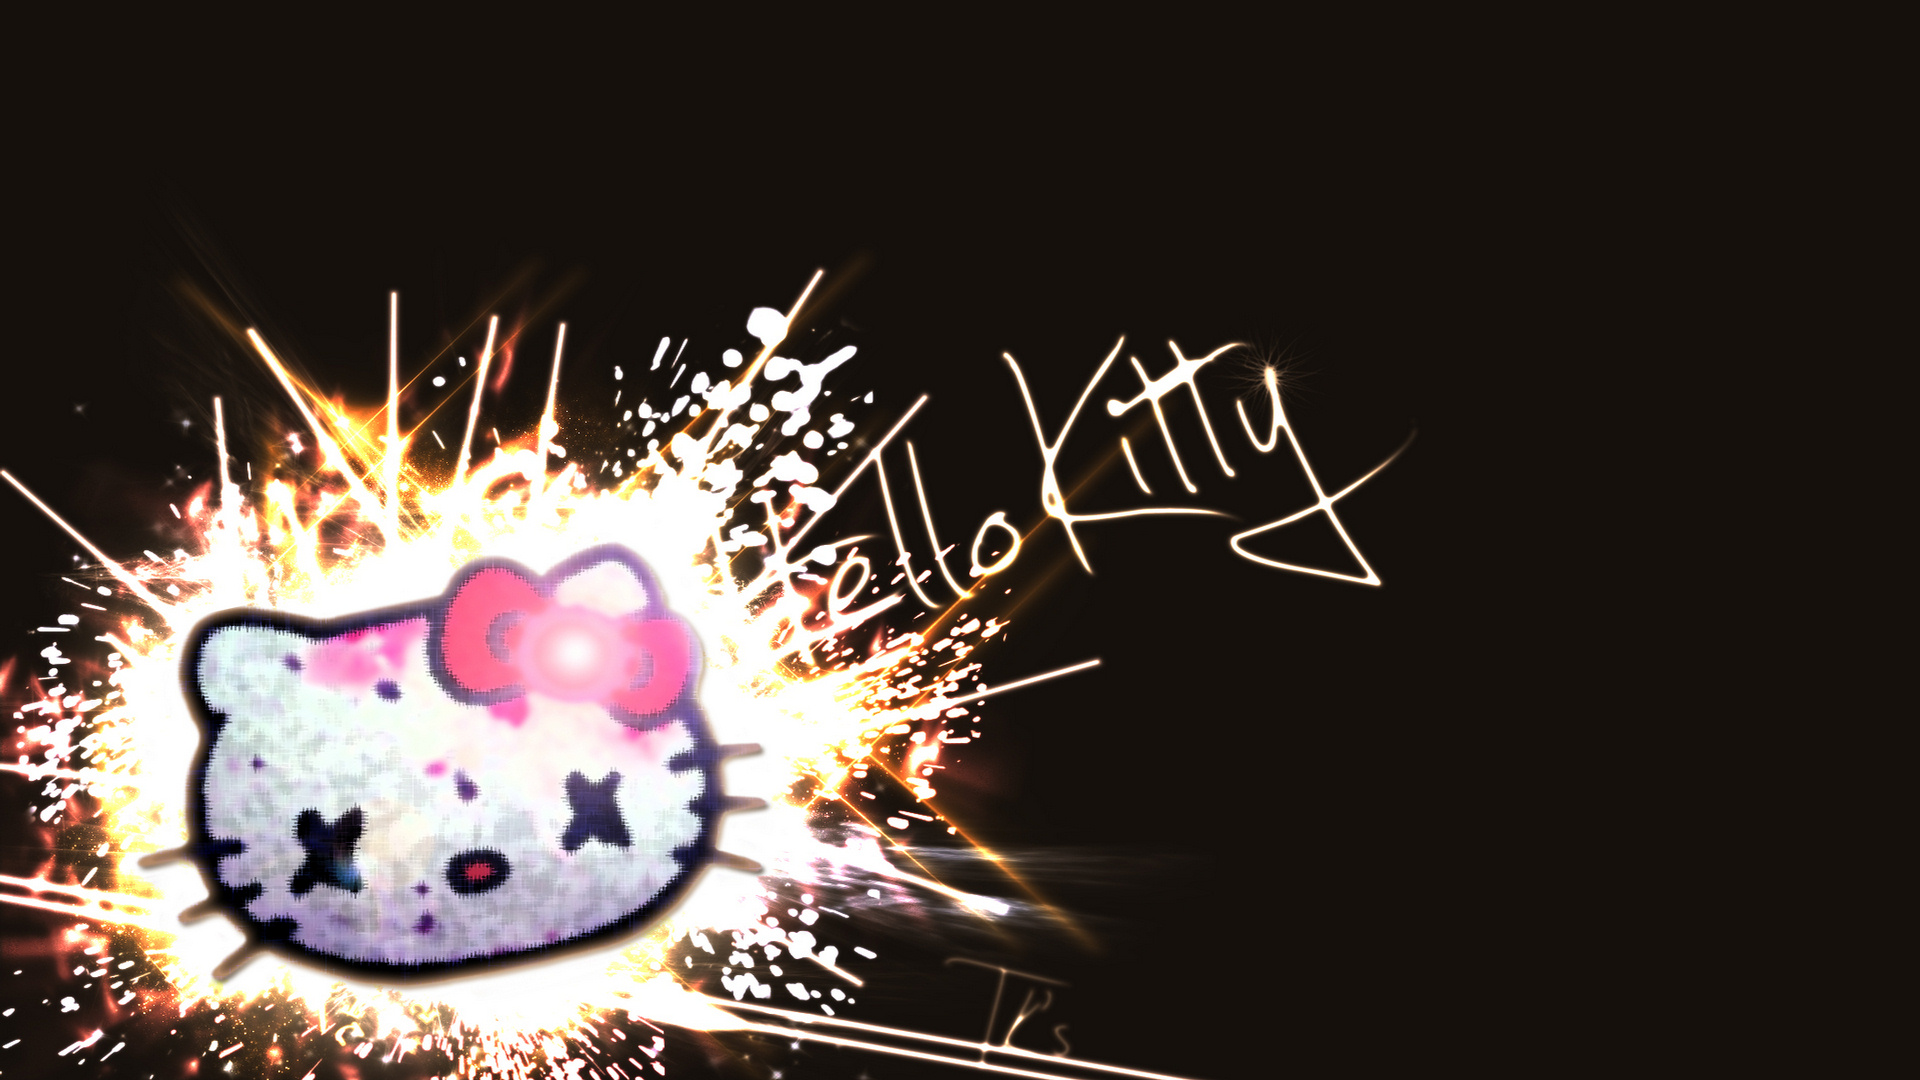 Hello kitty images hello kitty hd wallpaper and background - Hello Kitty Images Hello Kitty Hd Wallpaper And Background 56